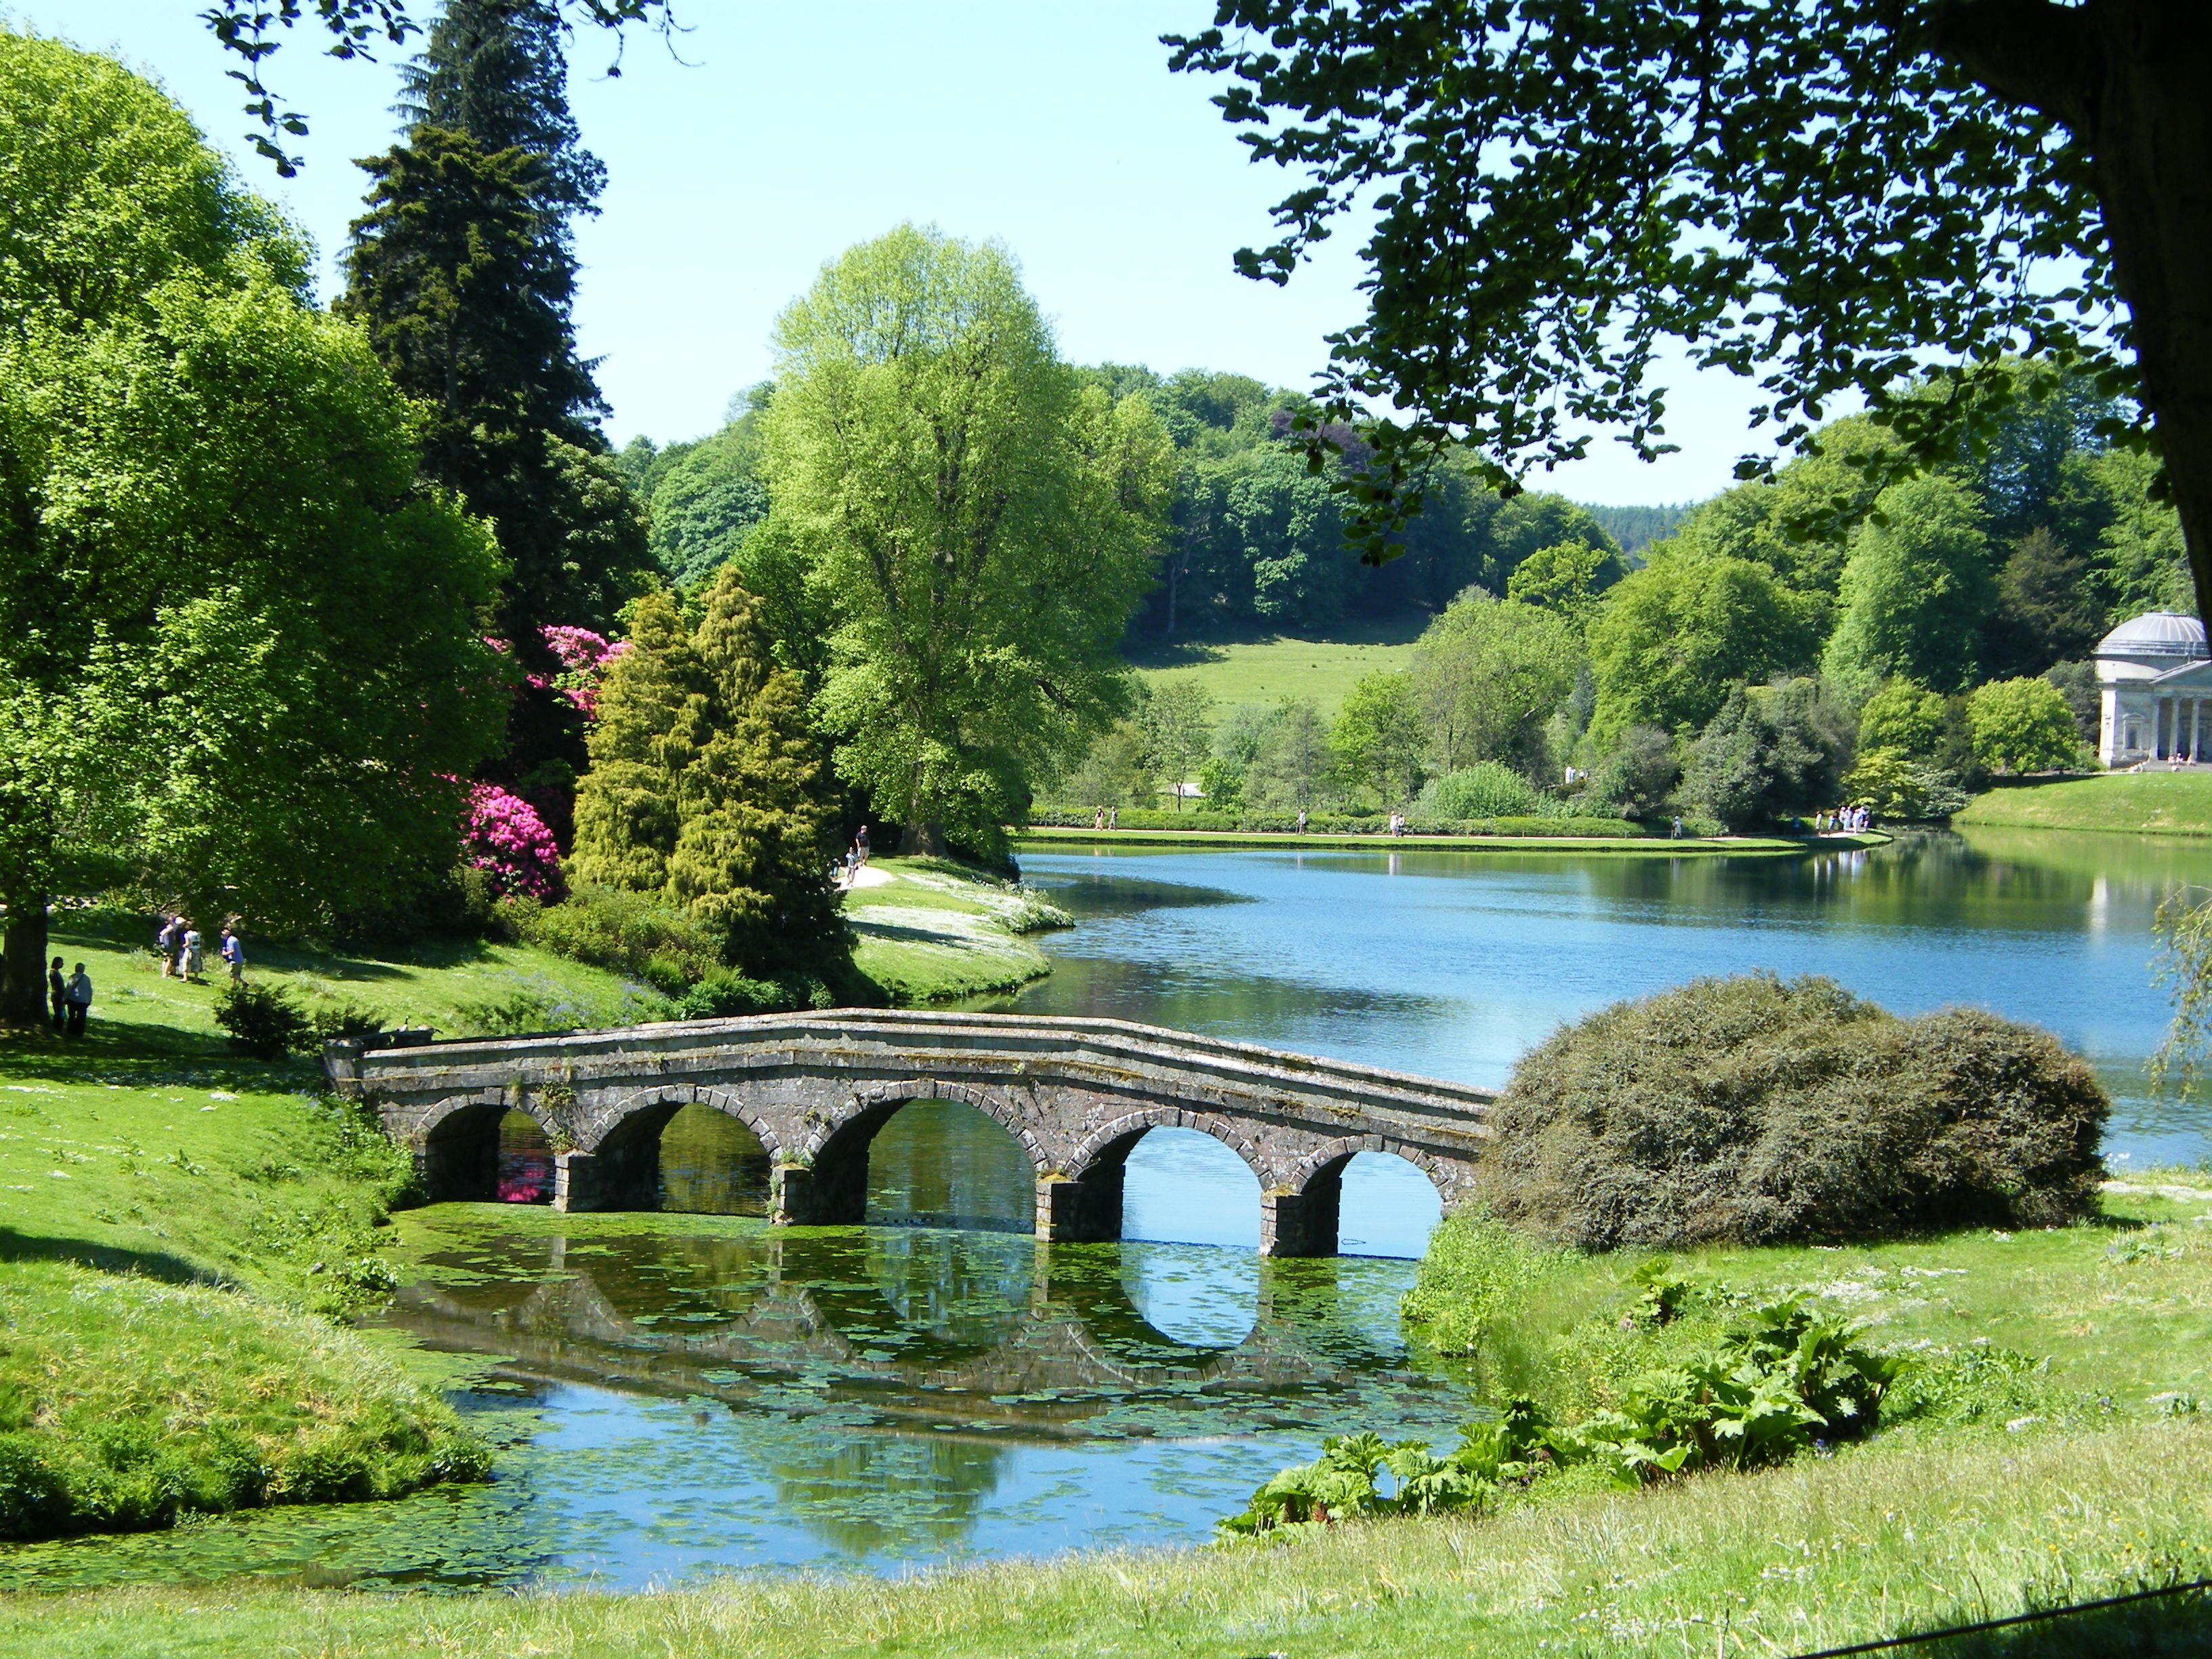 Home Garden Landscaping Stourhead Landscape Garden Image - Landscape gardens